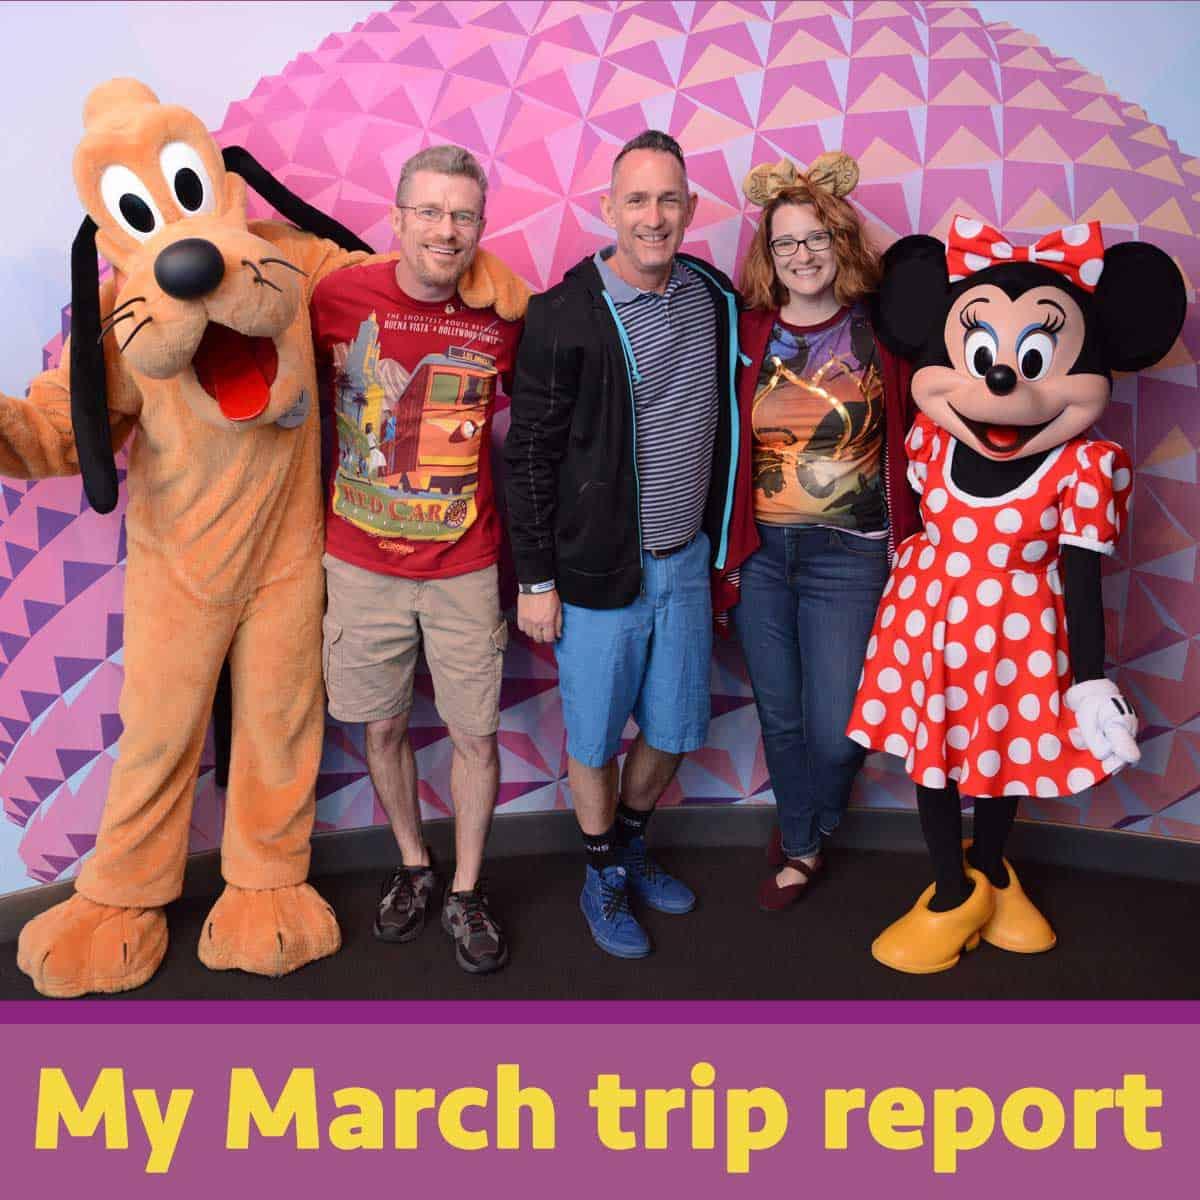 My March trip report | WDW Prep School